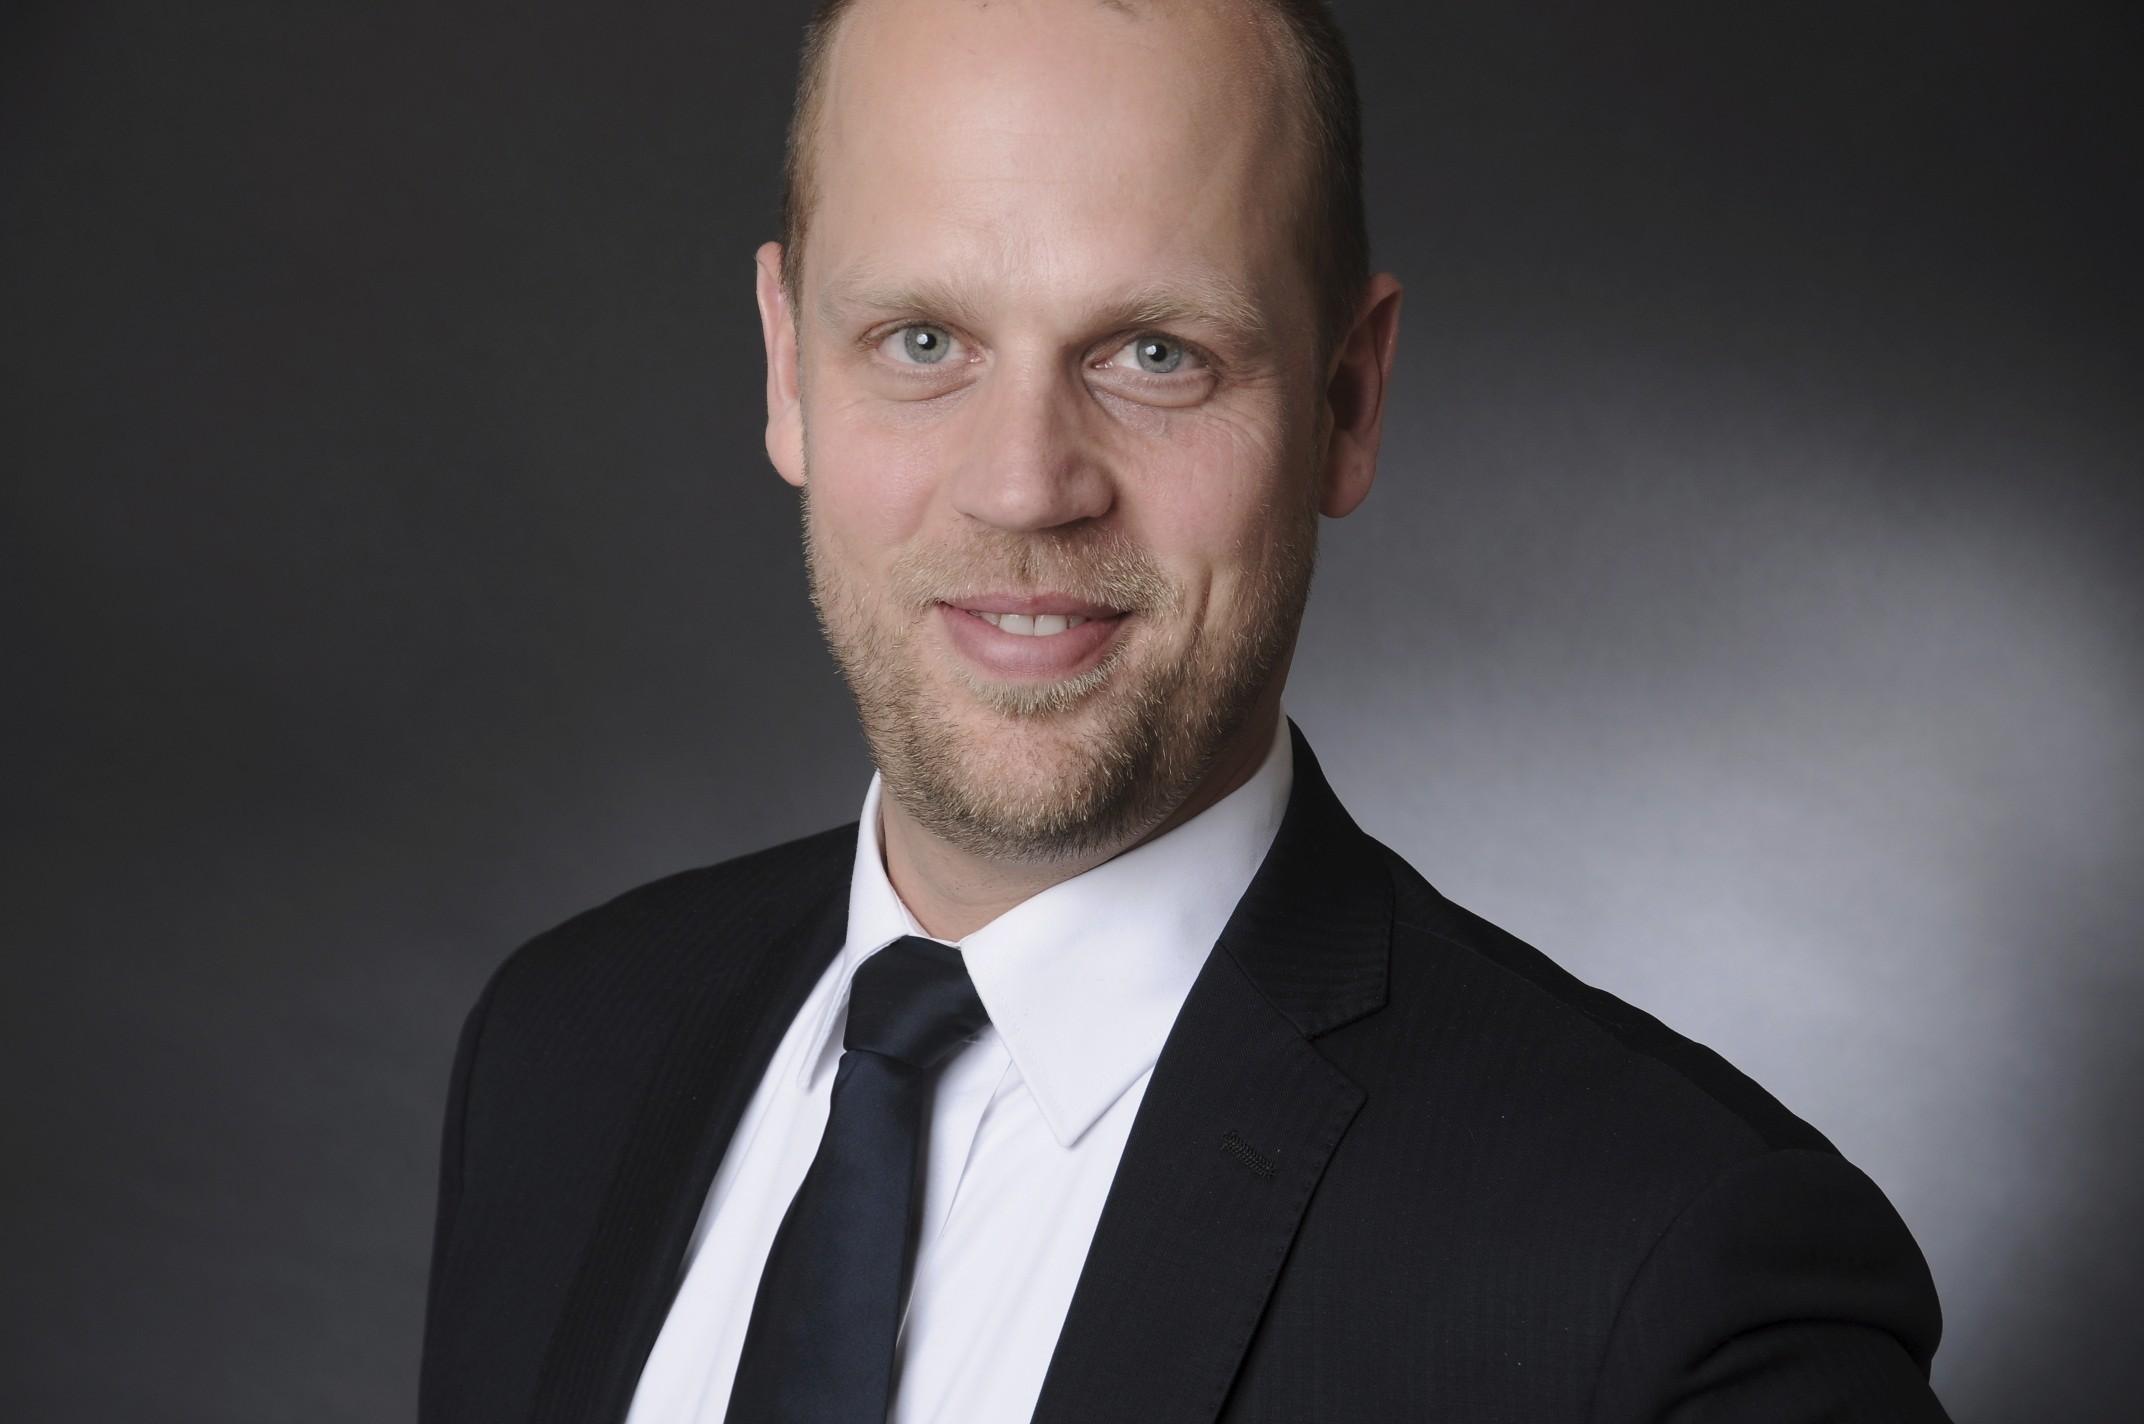 FSM-Geschäftsführer zu Jugendmedienschutz